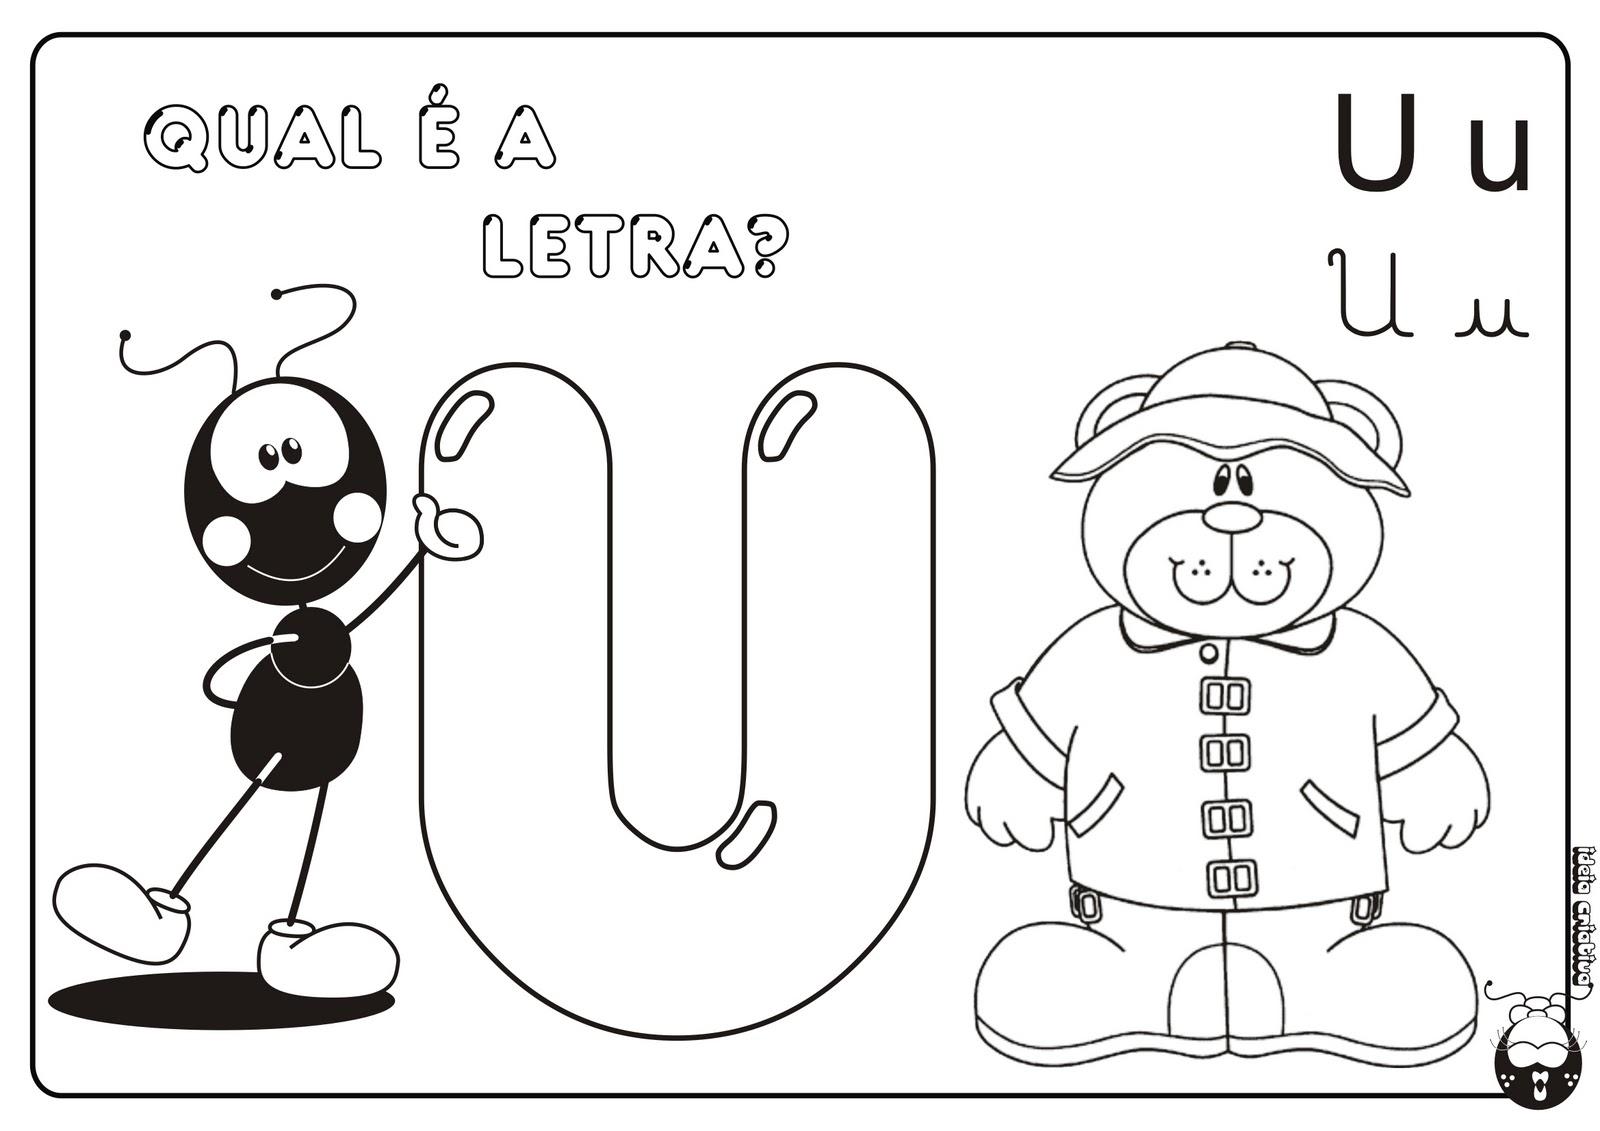 Alfabeto Smilinguido 4 tipos de letra para Baixar Grátis Letra u